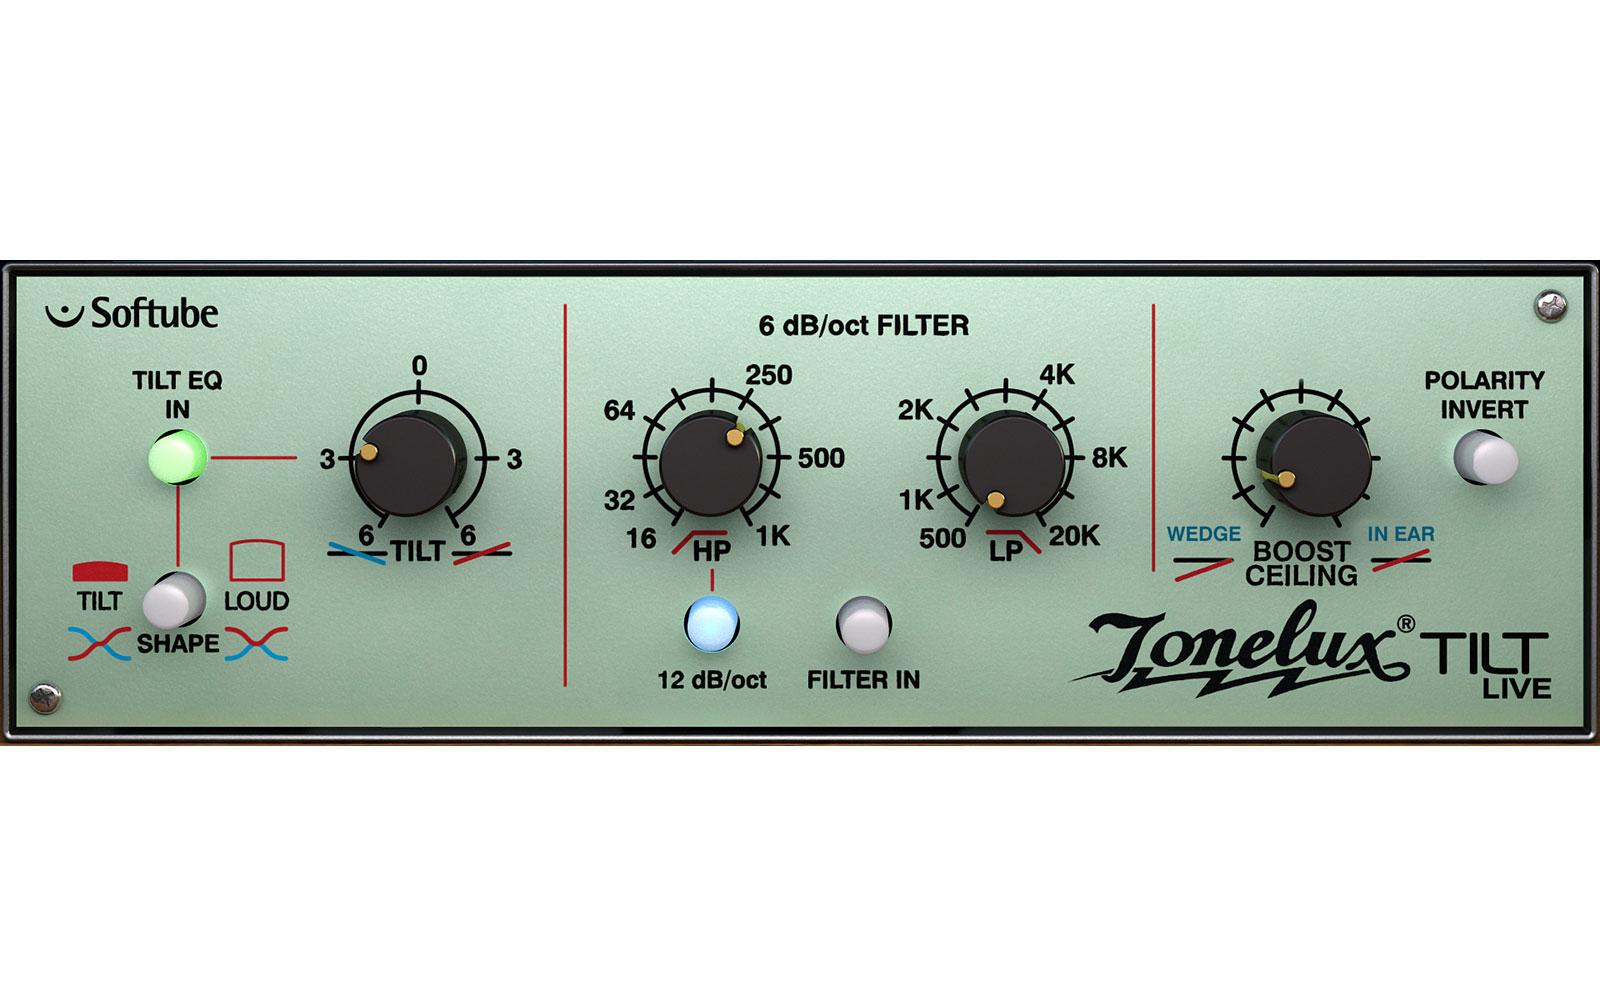 softube-tonelux-tilt-esd-download-